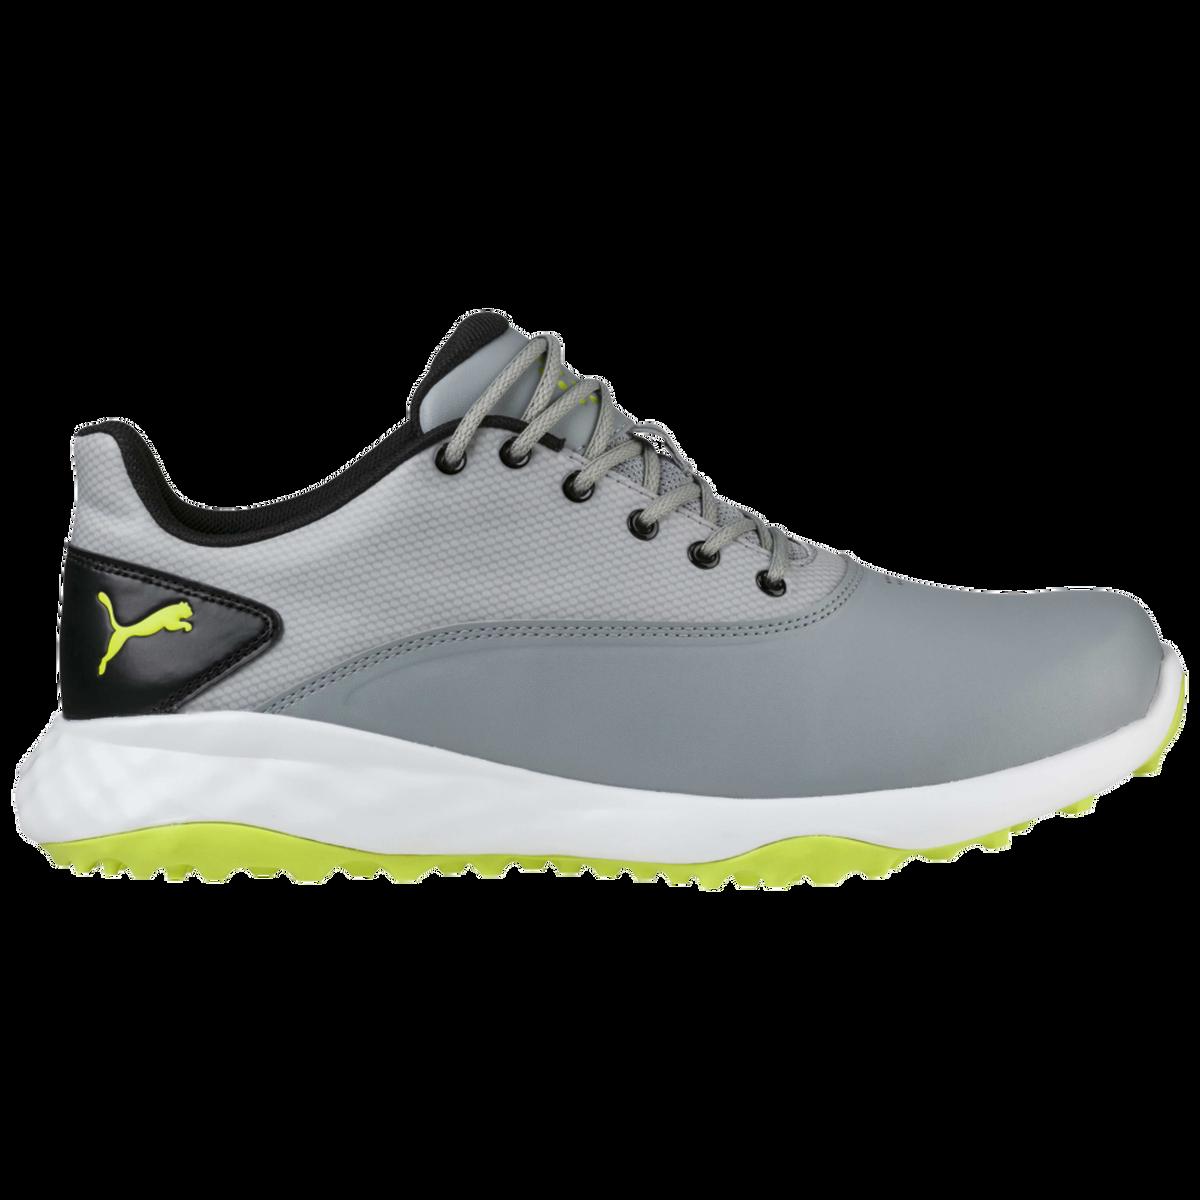 069f0d9b046 Images. PUMA Grip FUSION Men  39 s Golf Shoe - Grey Black